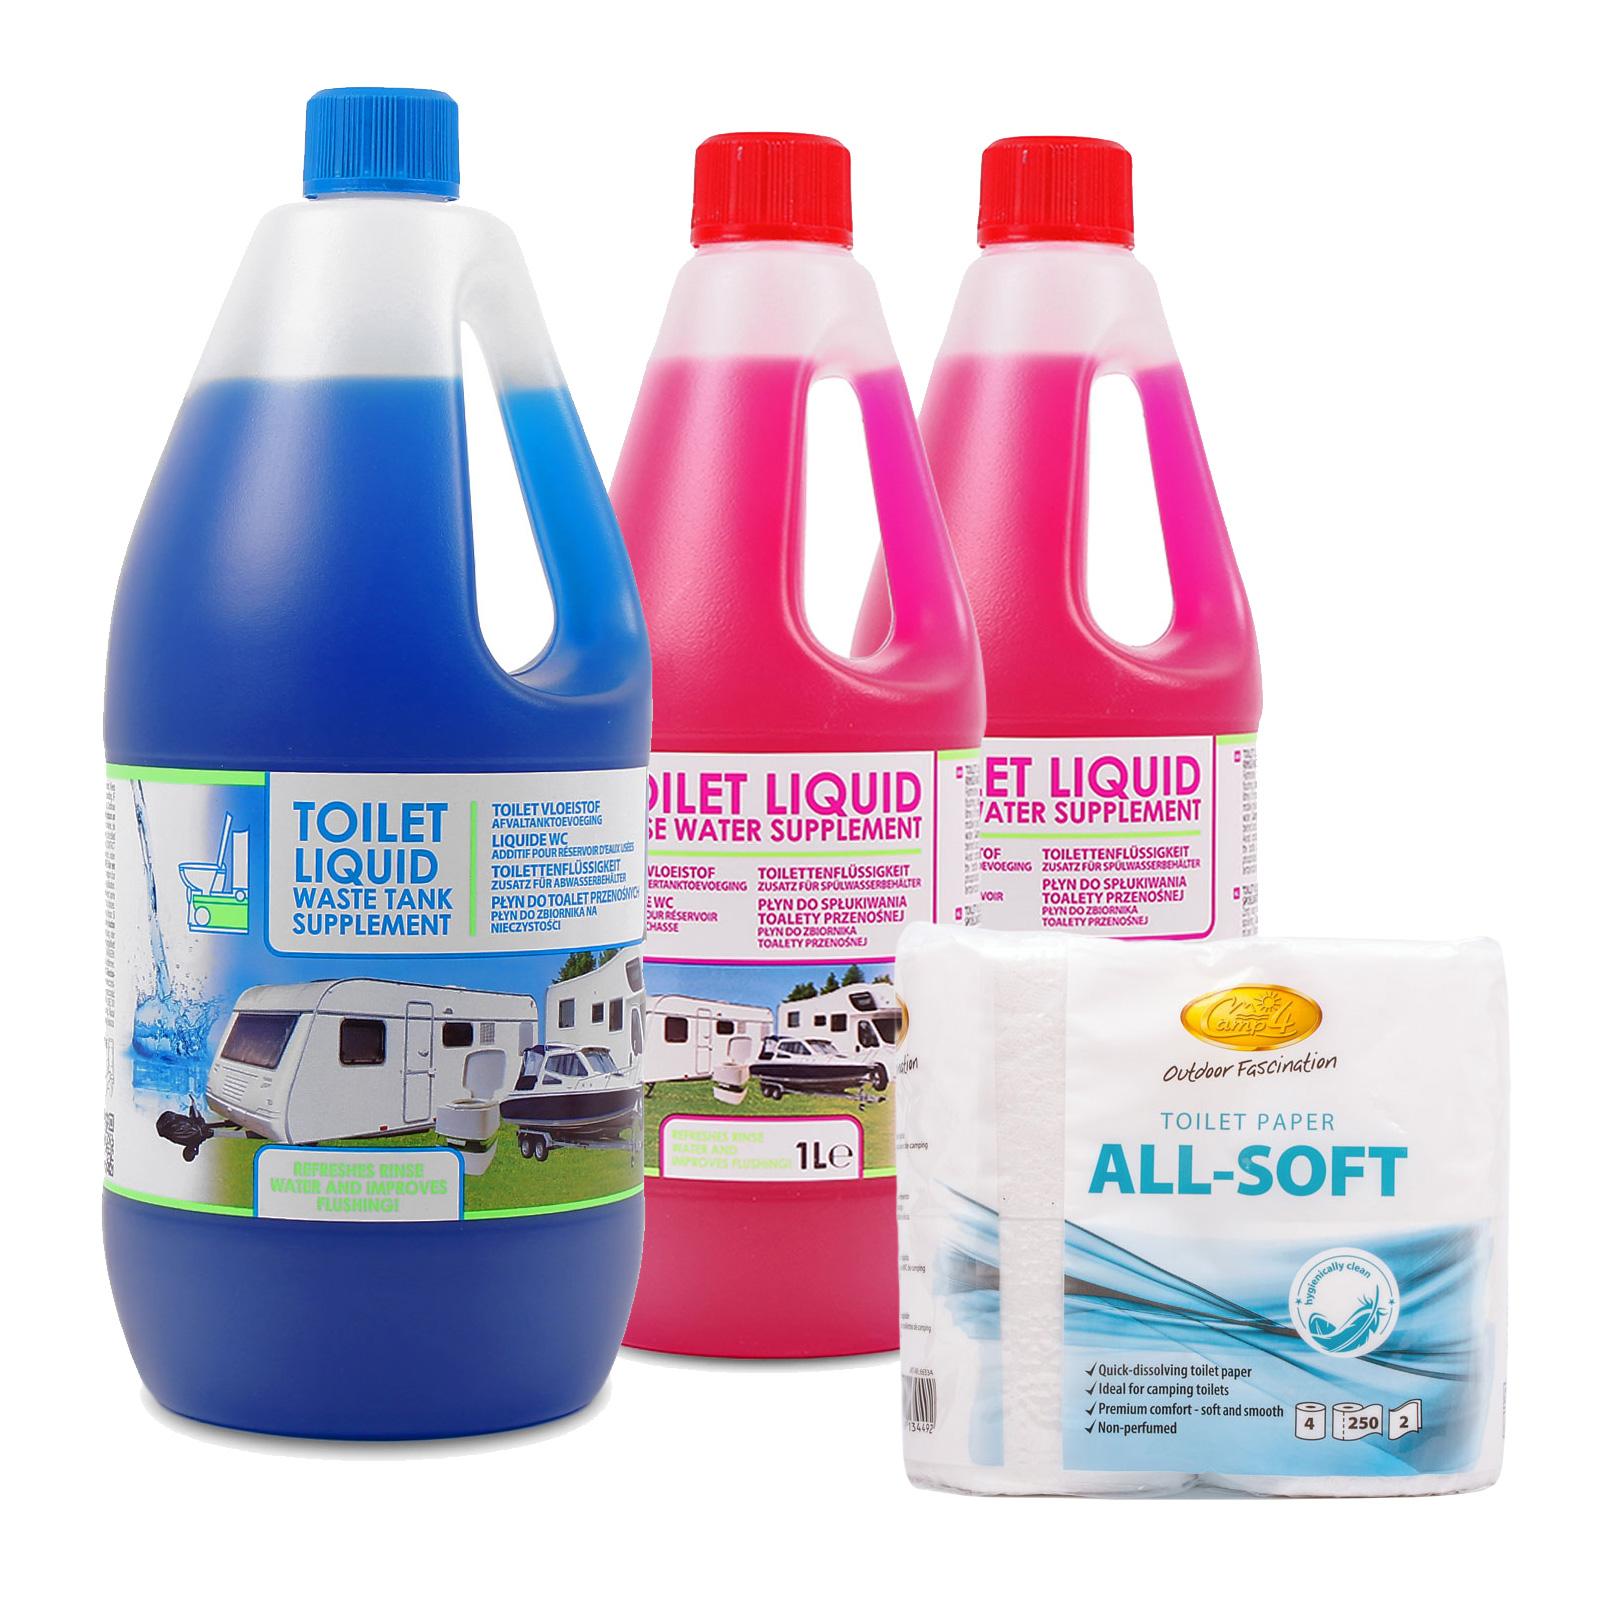 Toilettenzusatz, Chemietoiletten Abwasser & Spülkasten + Toilettenpapier